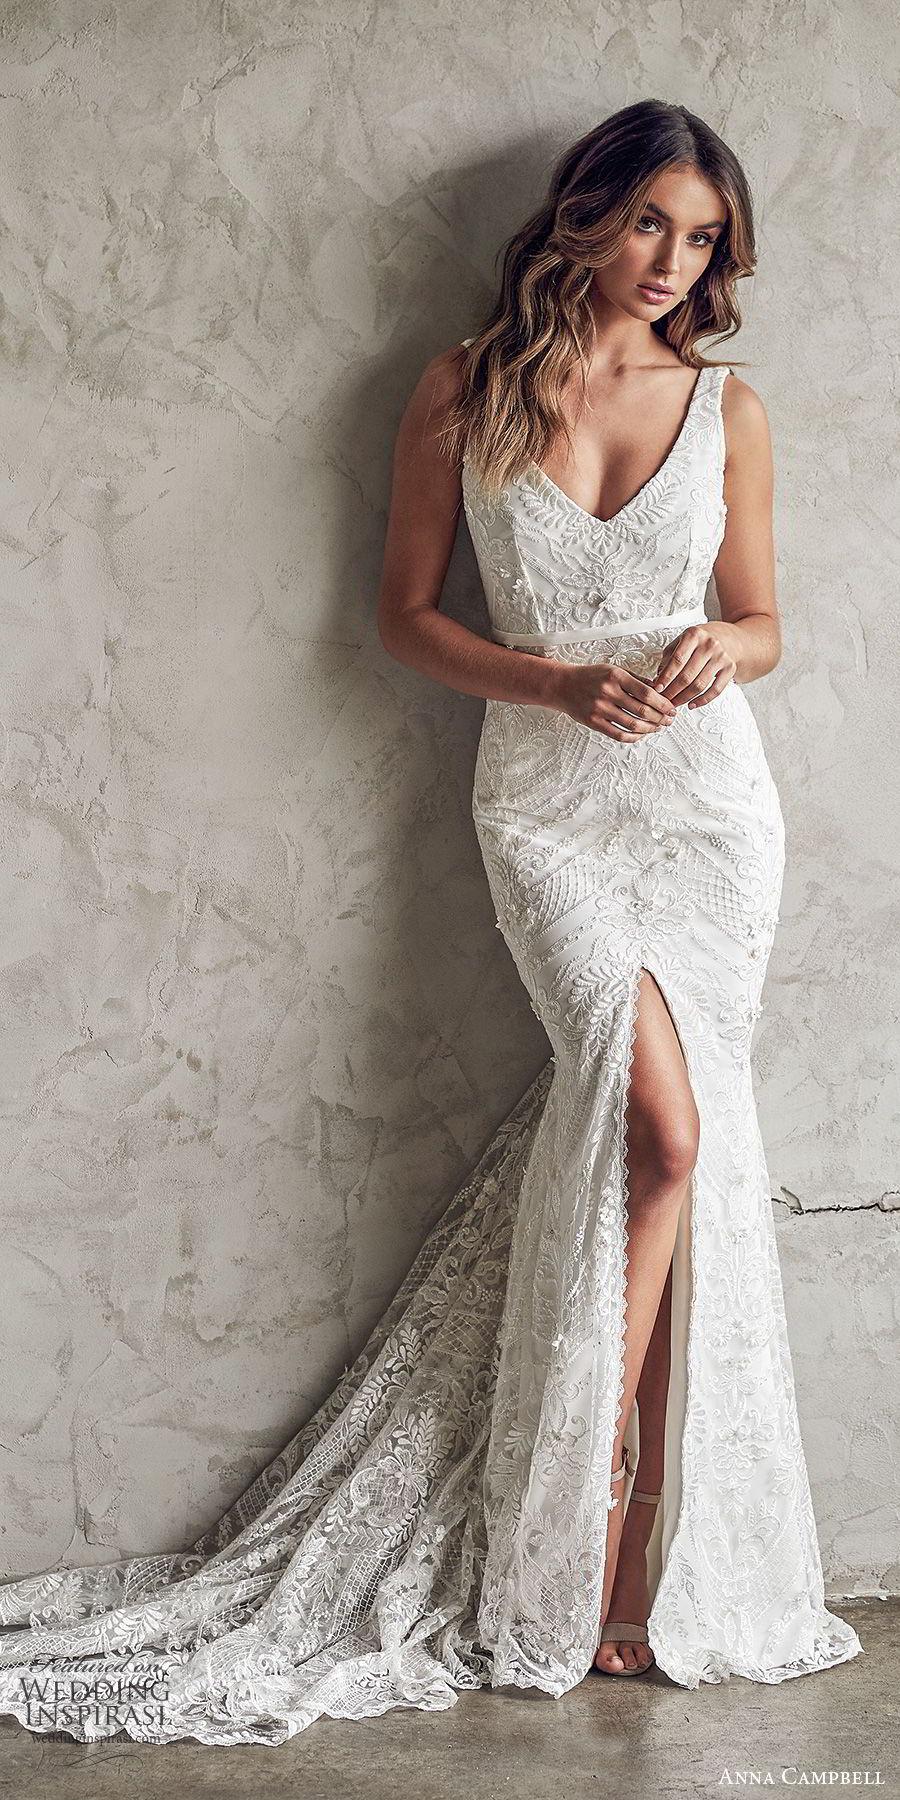 anna campbell 2020 bridal sleeveless thick straps deep v neckline fully embellished embroidered lace sheath wedding dress slit skirt (9) elegant sexy v back chapel train mv